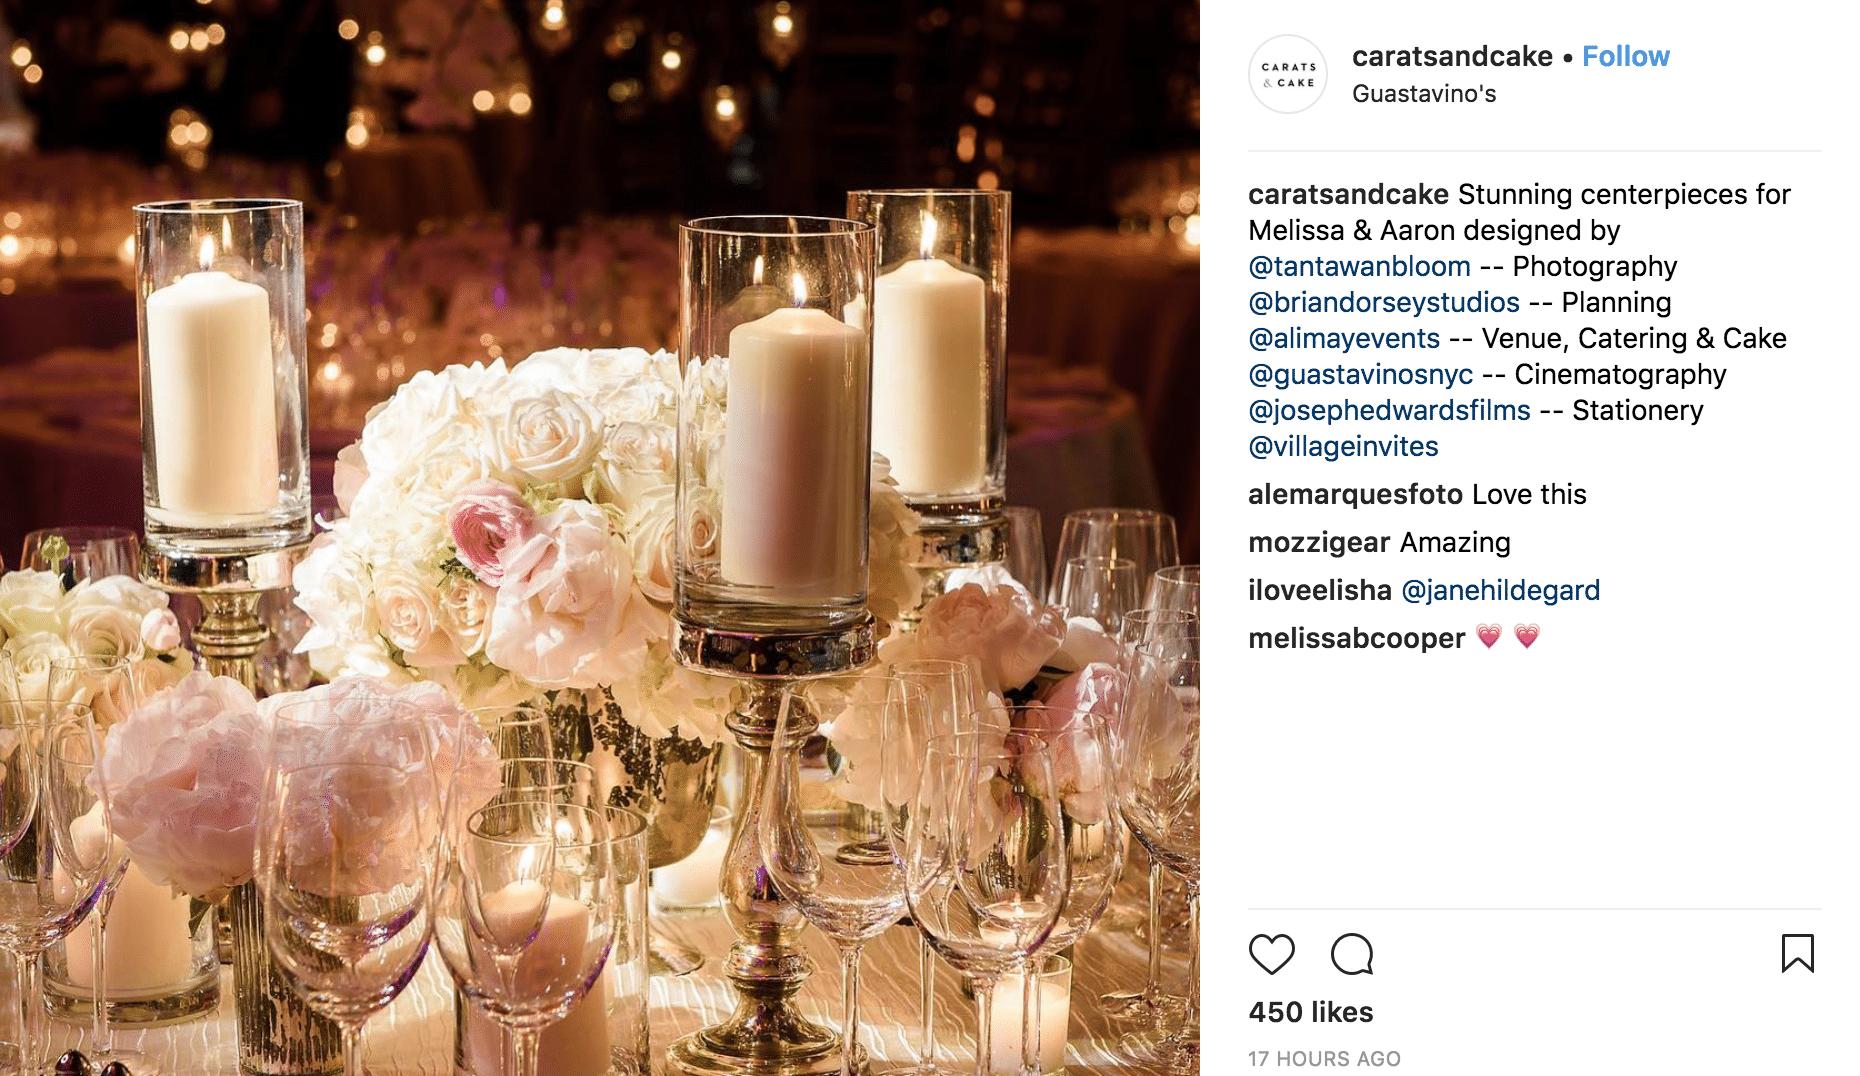 Instagram accounts to follow-caratsandcake